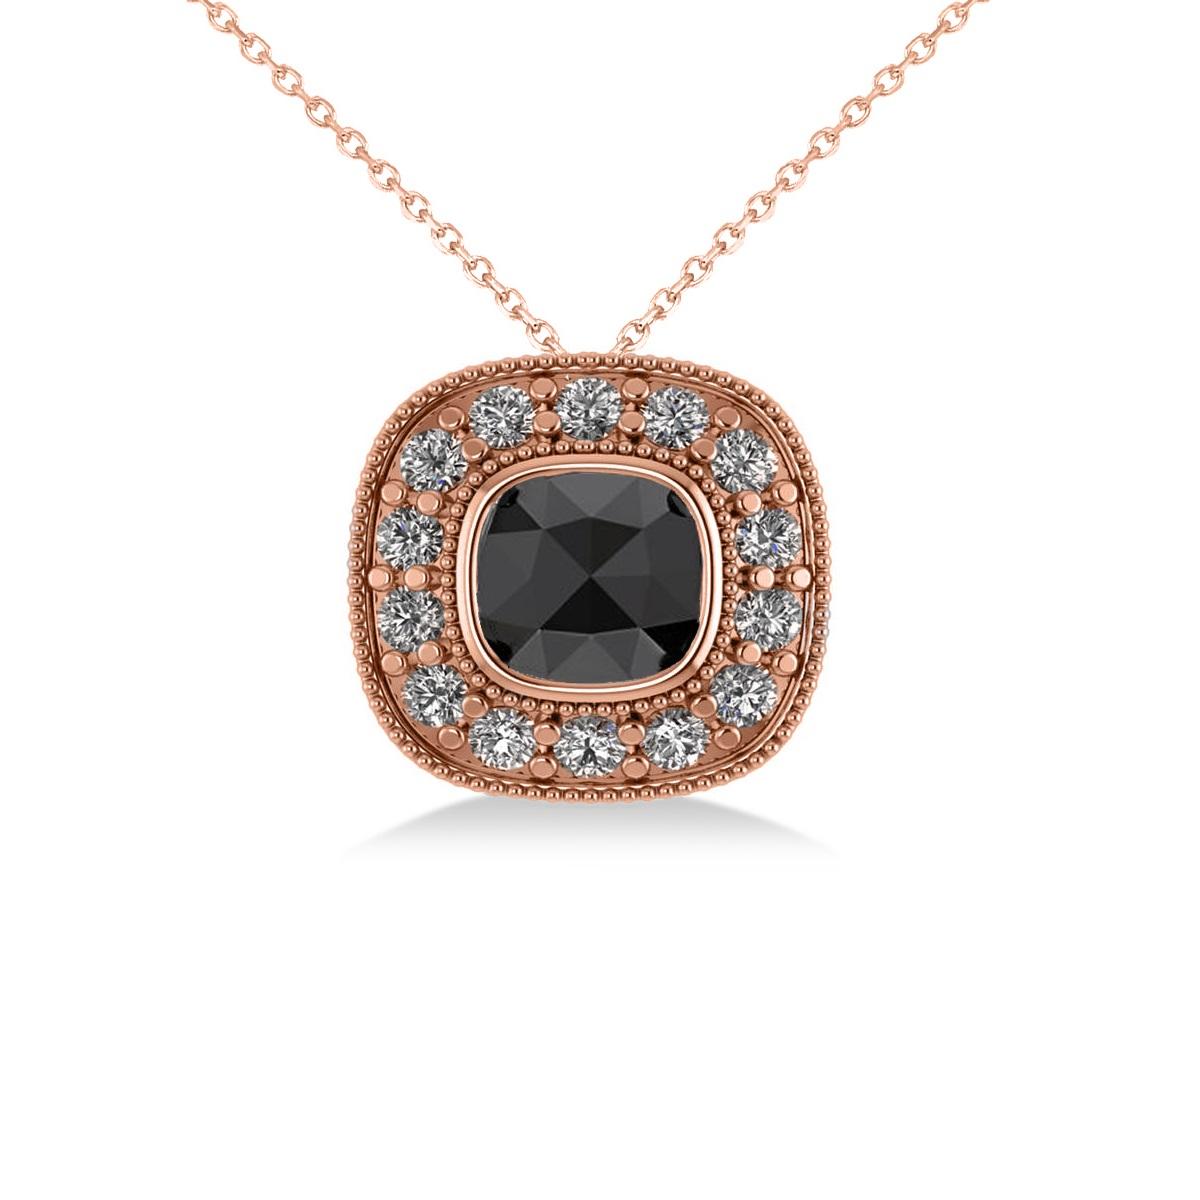 Black Diamond & Diamond Halo Cushion Pendant Necklace 14k Rose Gold (1.26ct)